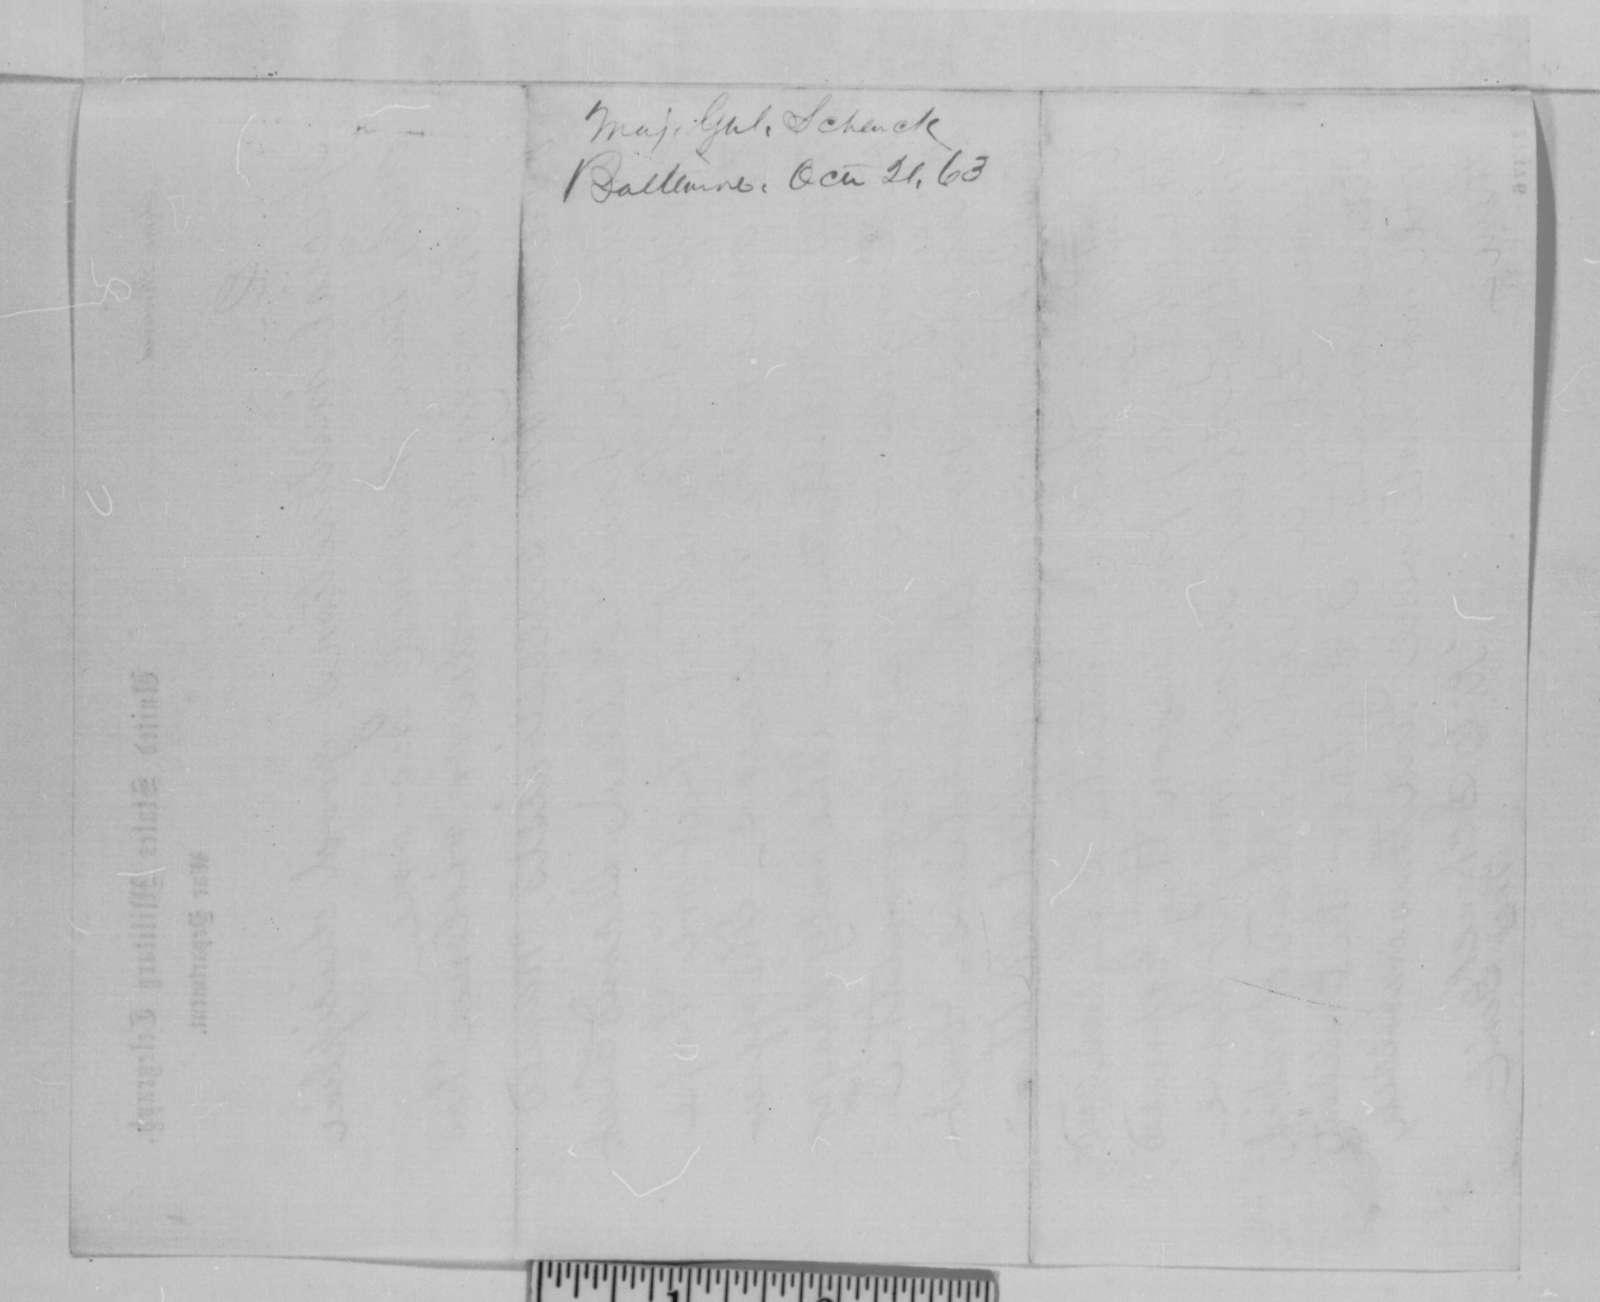 Robert C. Schenck to Abraham Lincoln, Wednesday, October 21, 1863  (Telegram concerning behavior of black troops in Maryland)